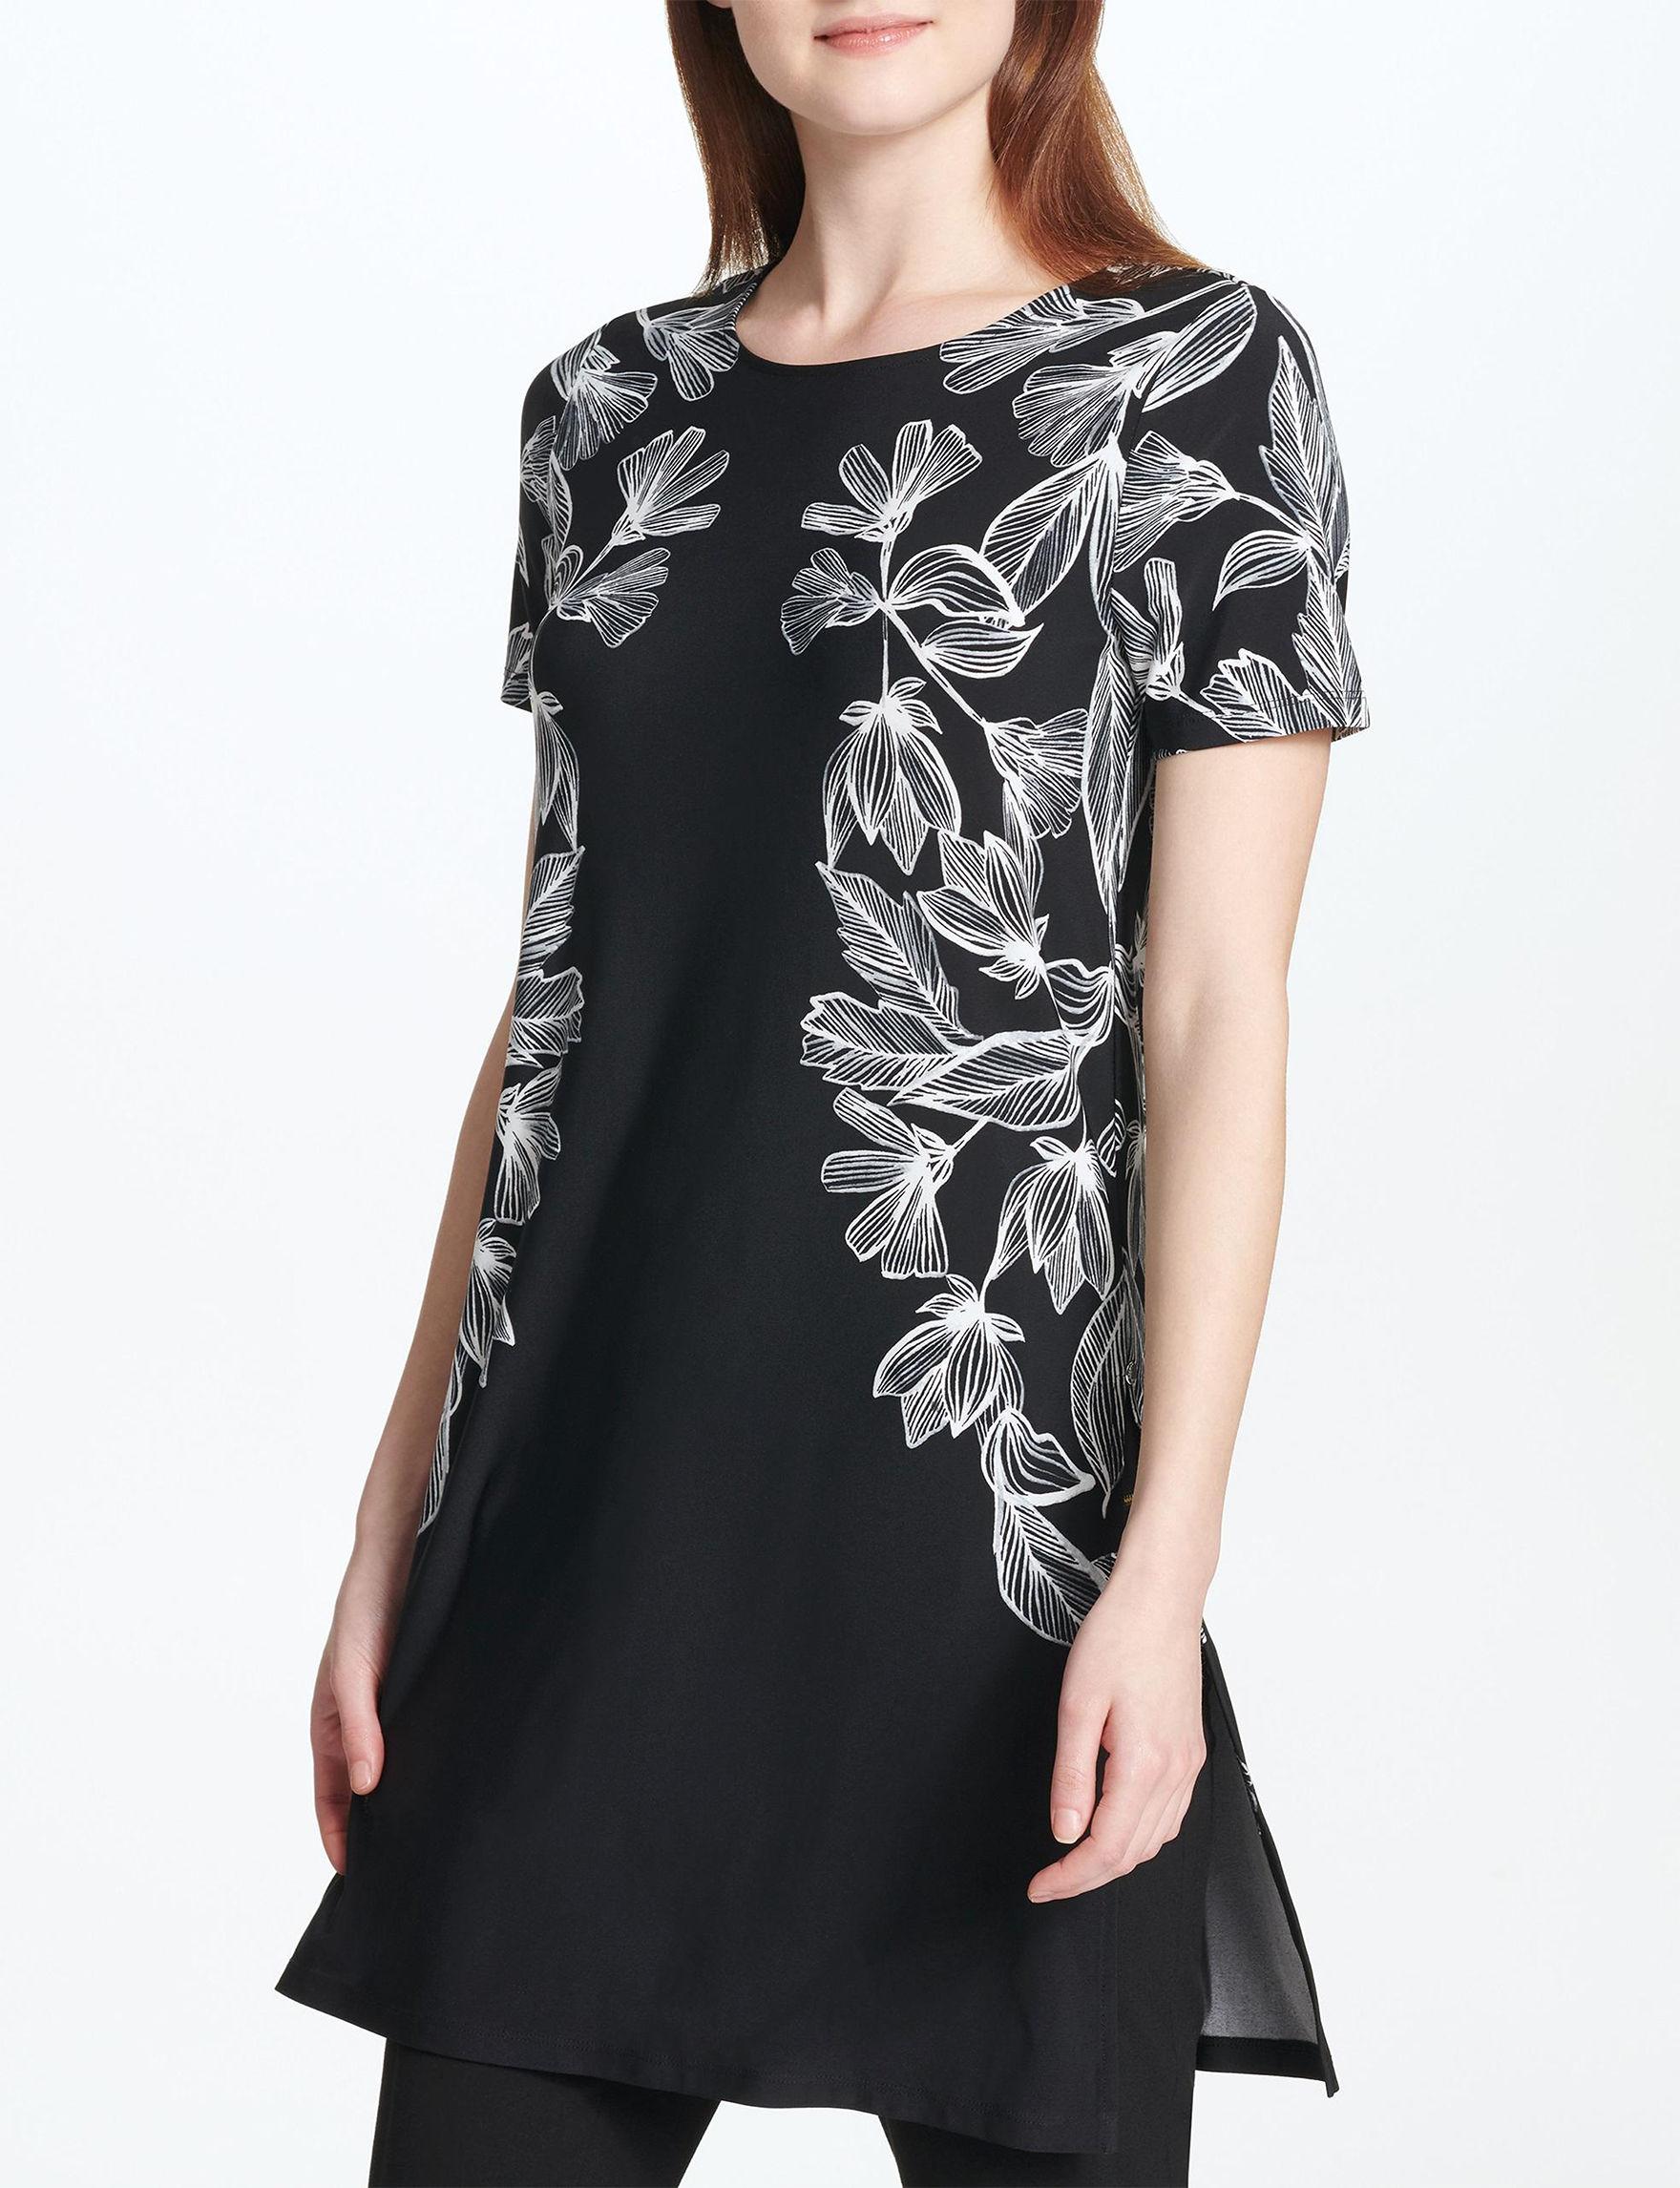 Calvin Klein Black Tunics